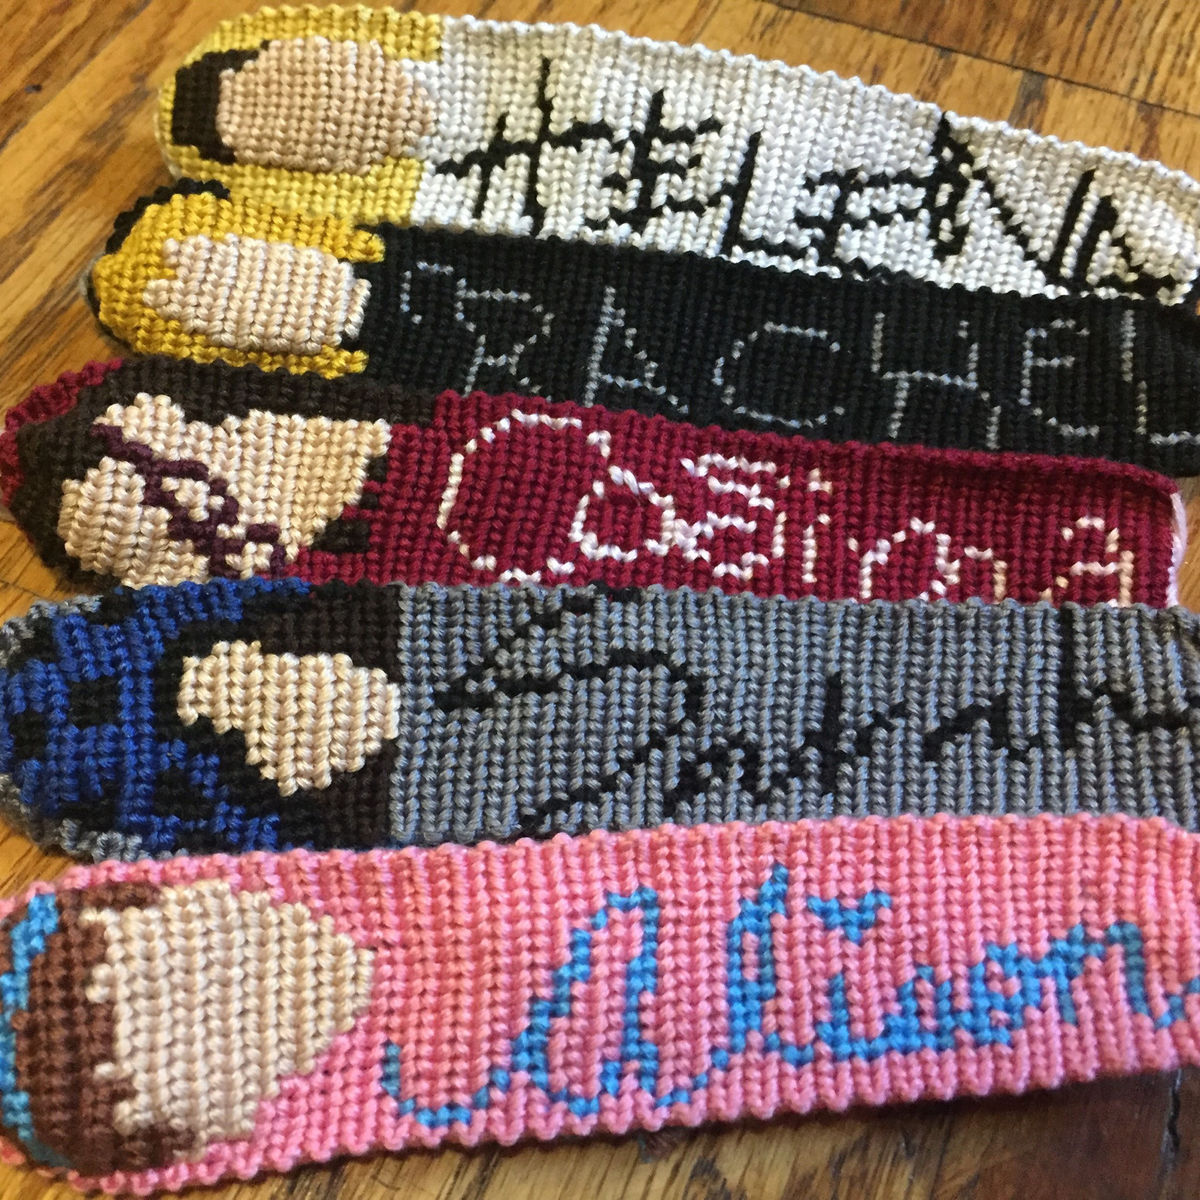 miriam_salzman_orphan_black_bracelets.jpg